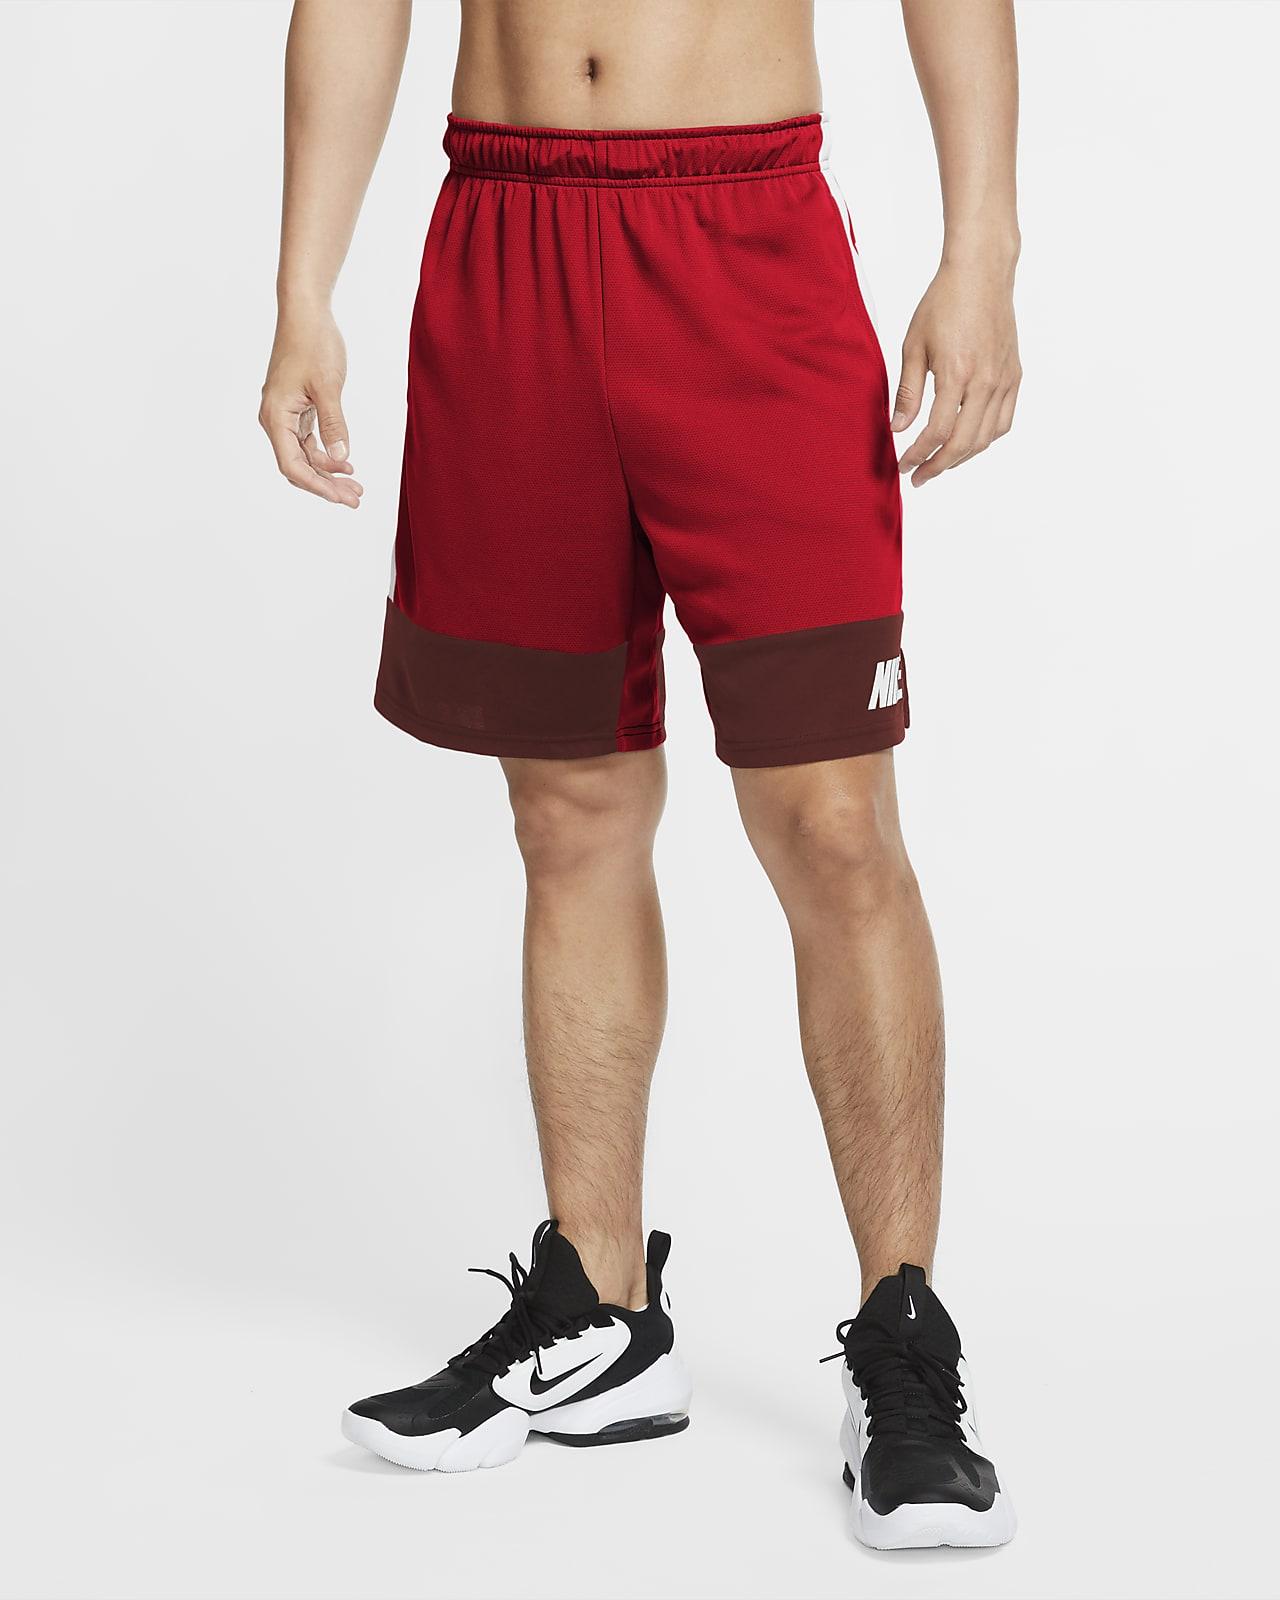 Nike Dri-FIT Erkek Antrenman Şortu